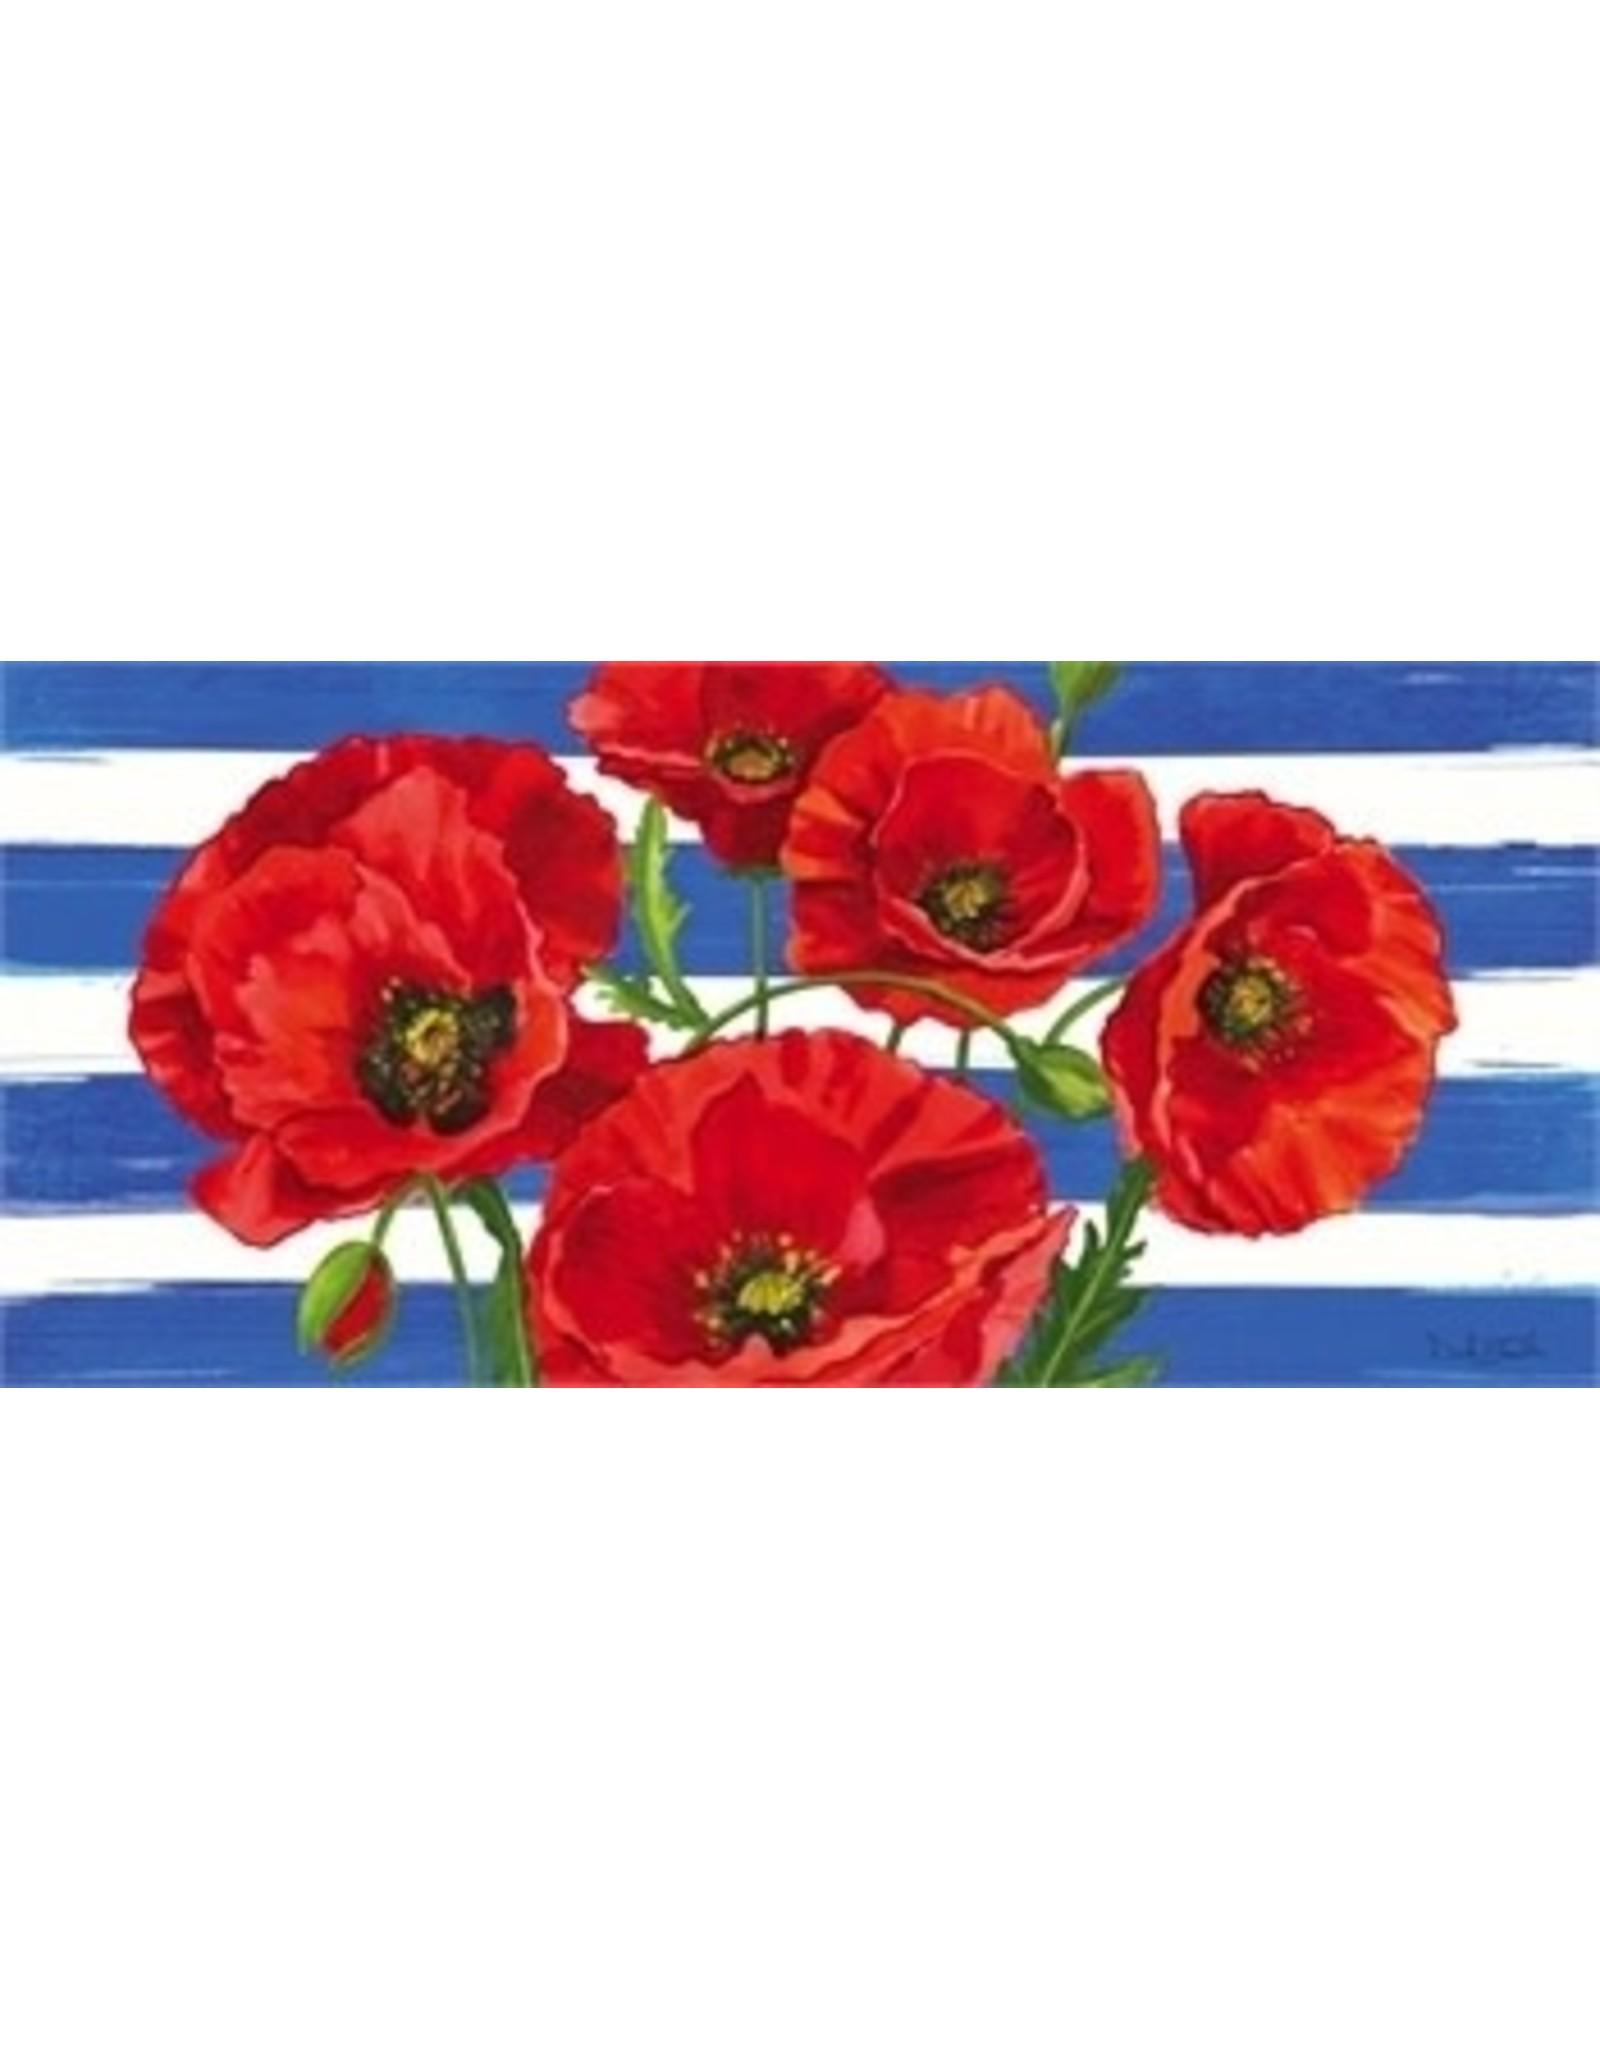 Evergreen Enterprises Poppies & Stripes Sassafras Switch Mat